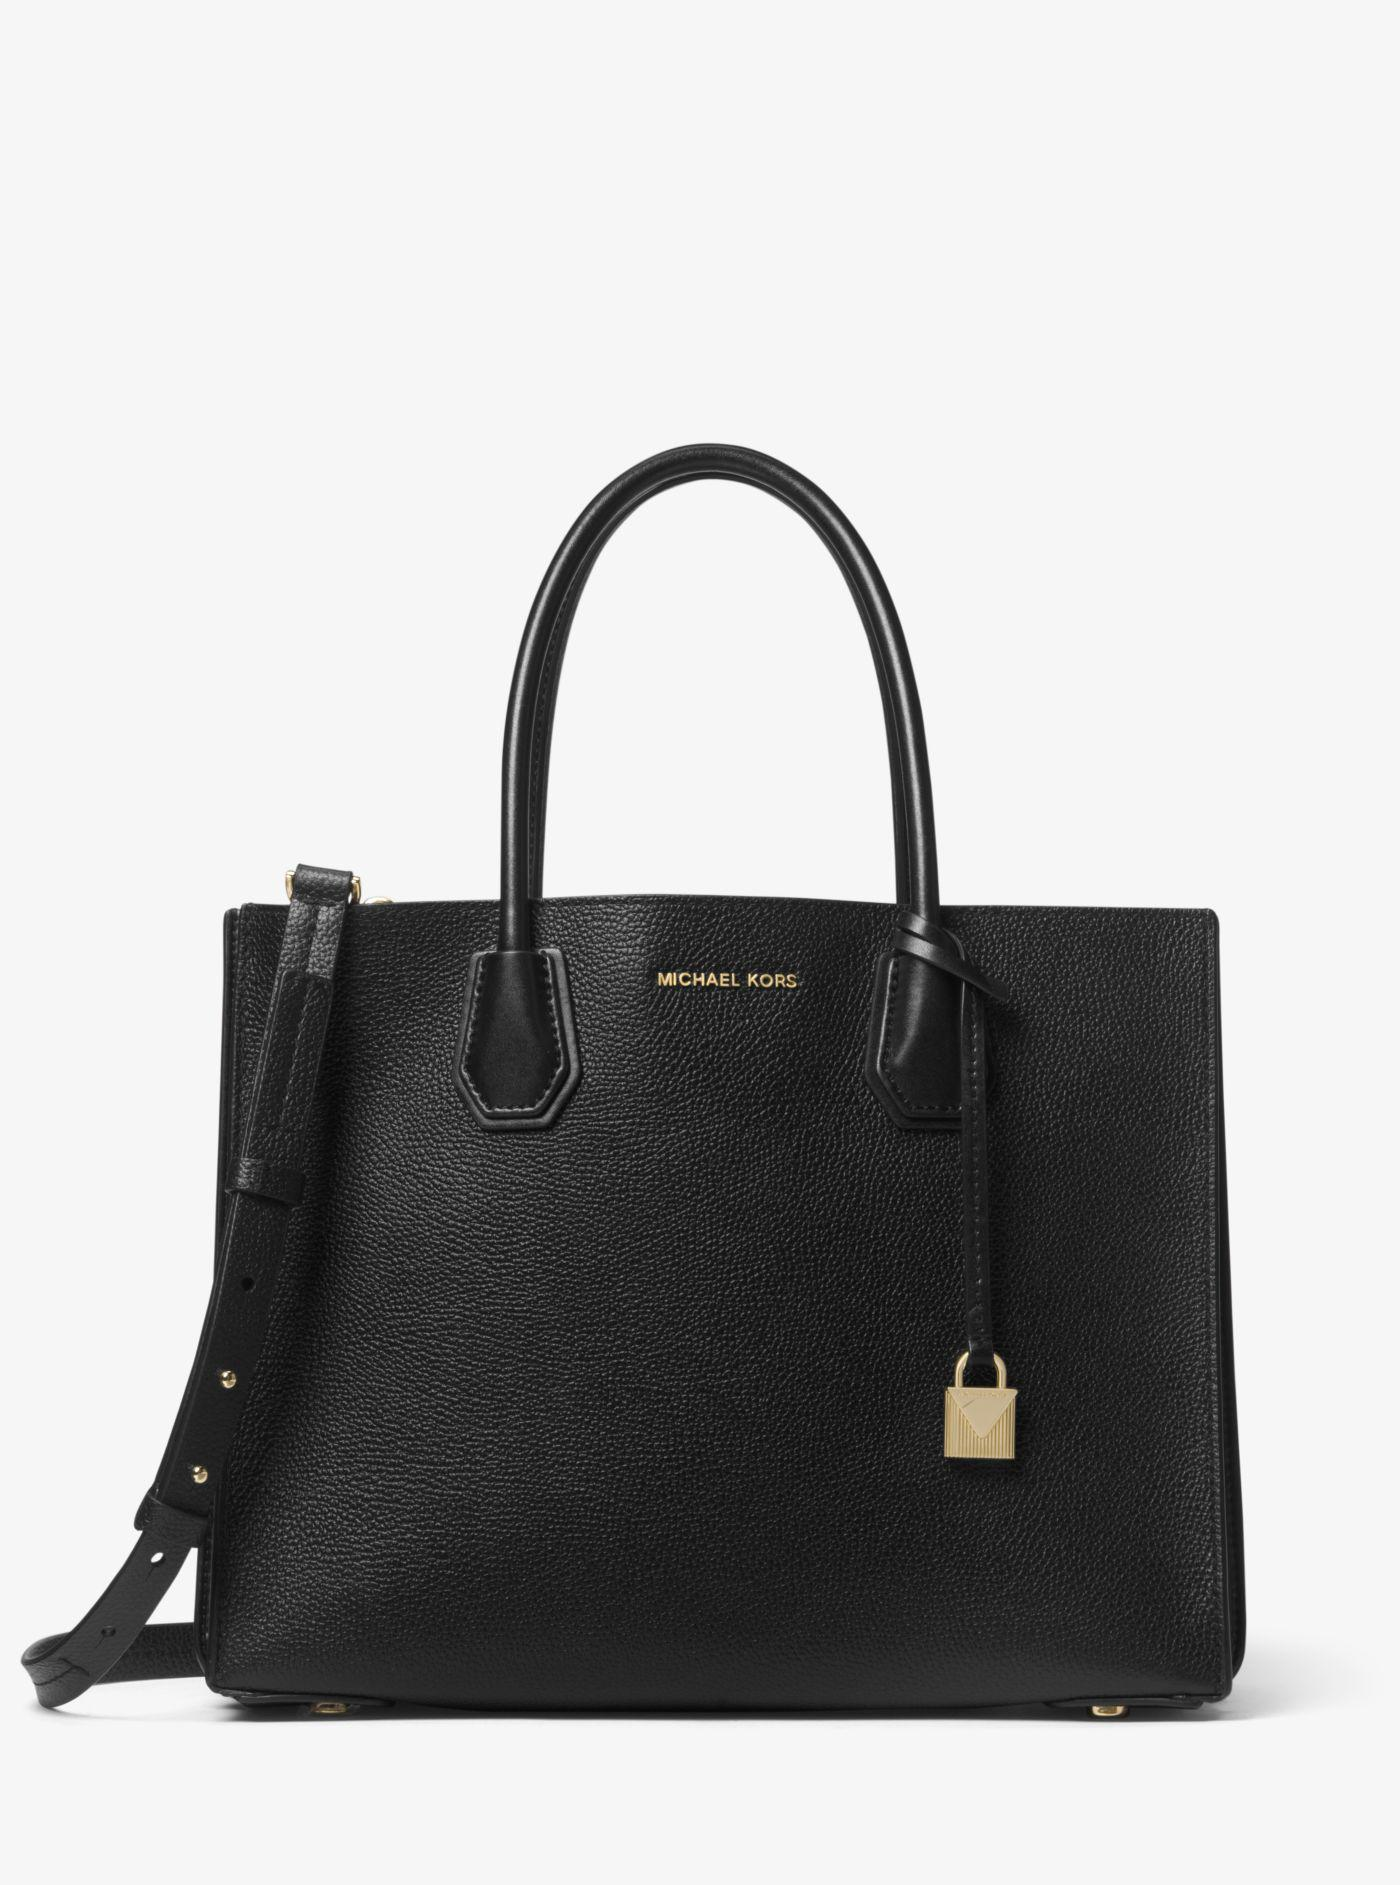 MICHAEL Michael Kors. Women s Mercer Large Accordion Convertible Tote Bag  In Black Grained Calfskin 2df0fbe13